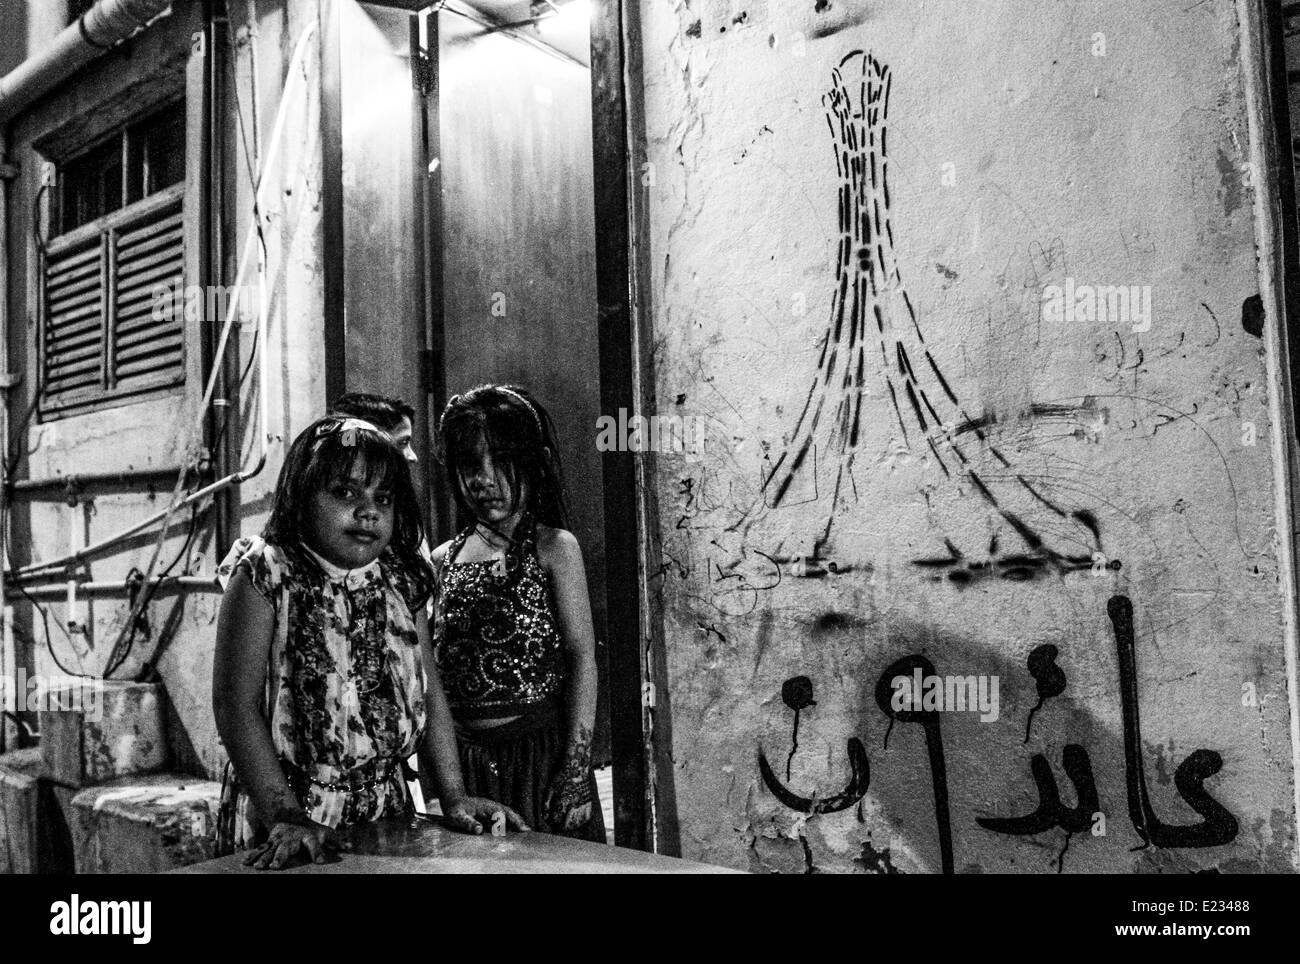 June 14, 2014 - Sanabis, Bahrain - Bahrain , Sanabis - Imam AlMahdi Festival in the village of Sanabis west of the - Stock Image